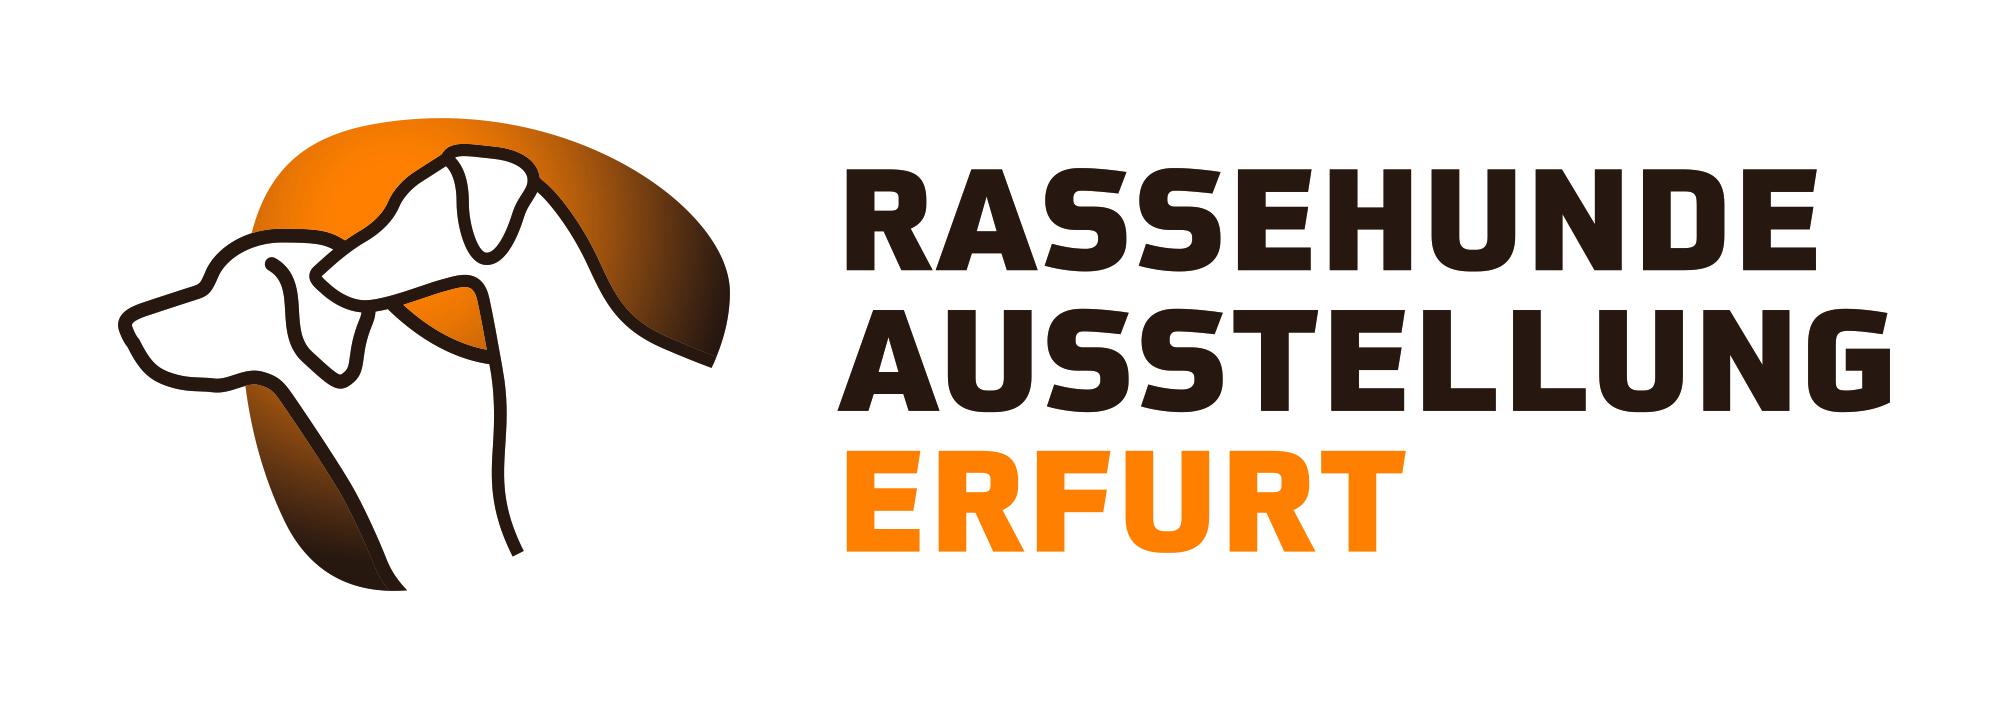 Rassehundeausstellung Erfurt (CACIB)